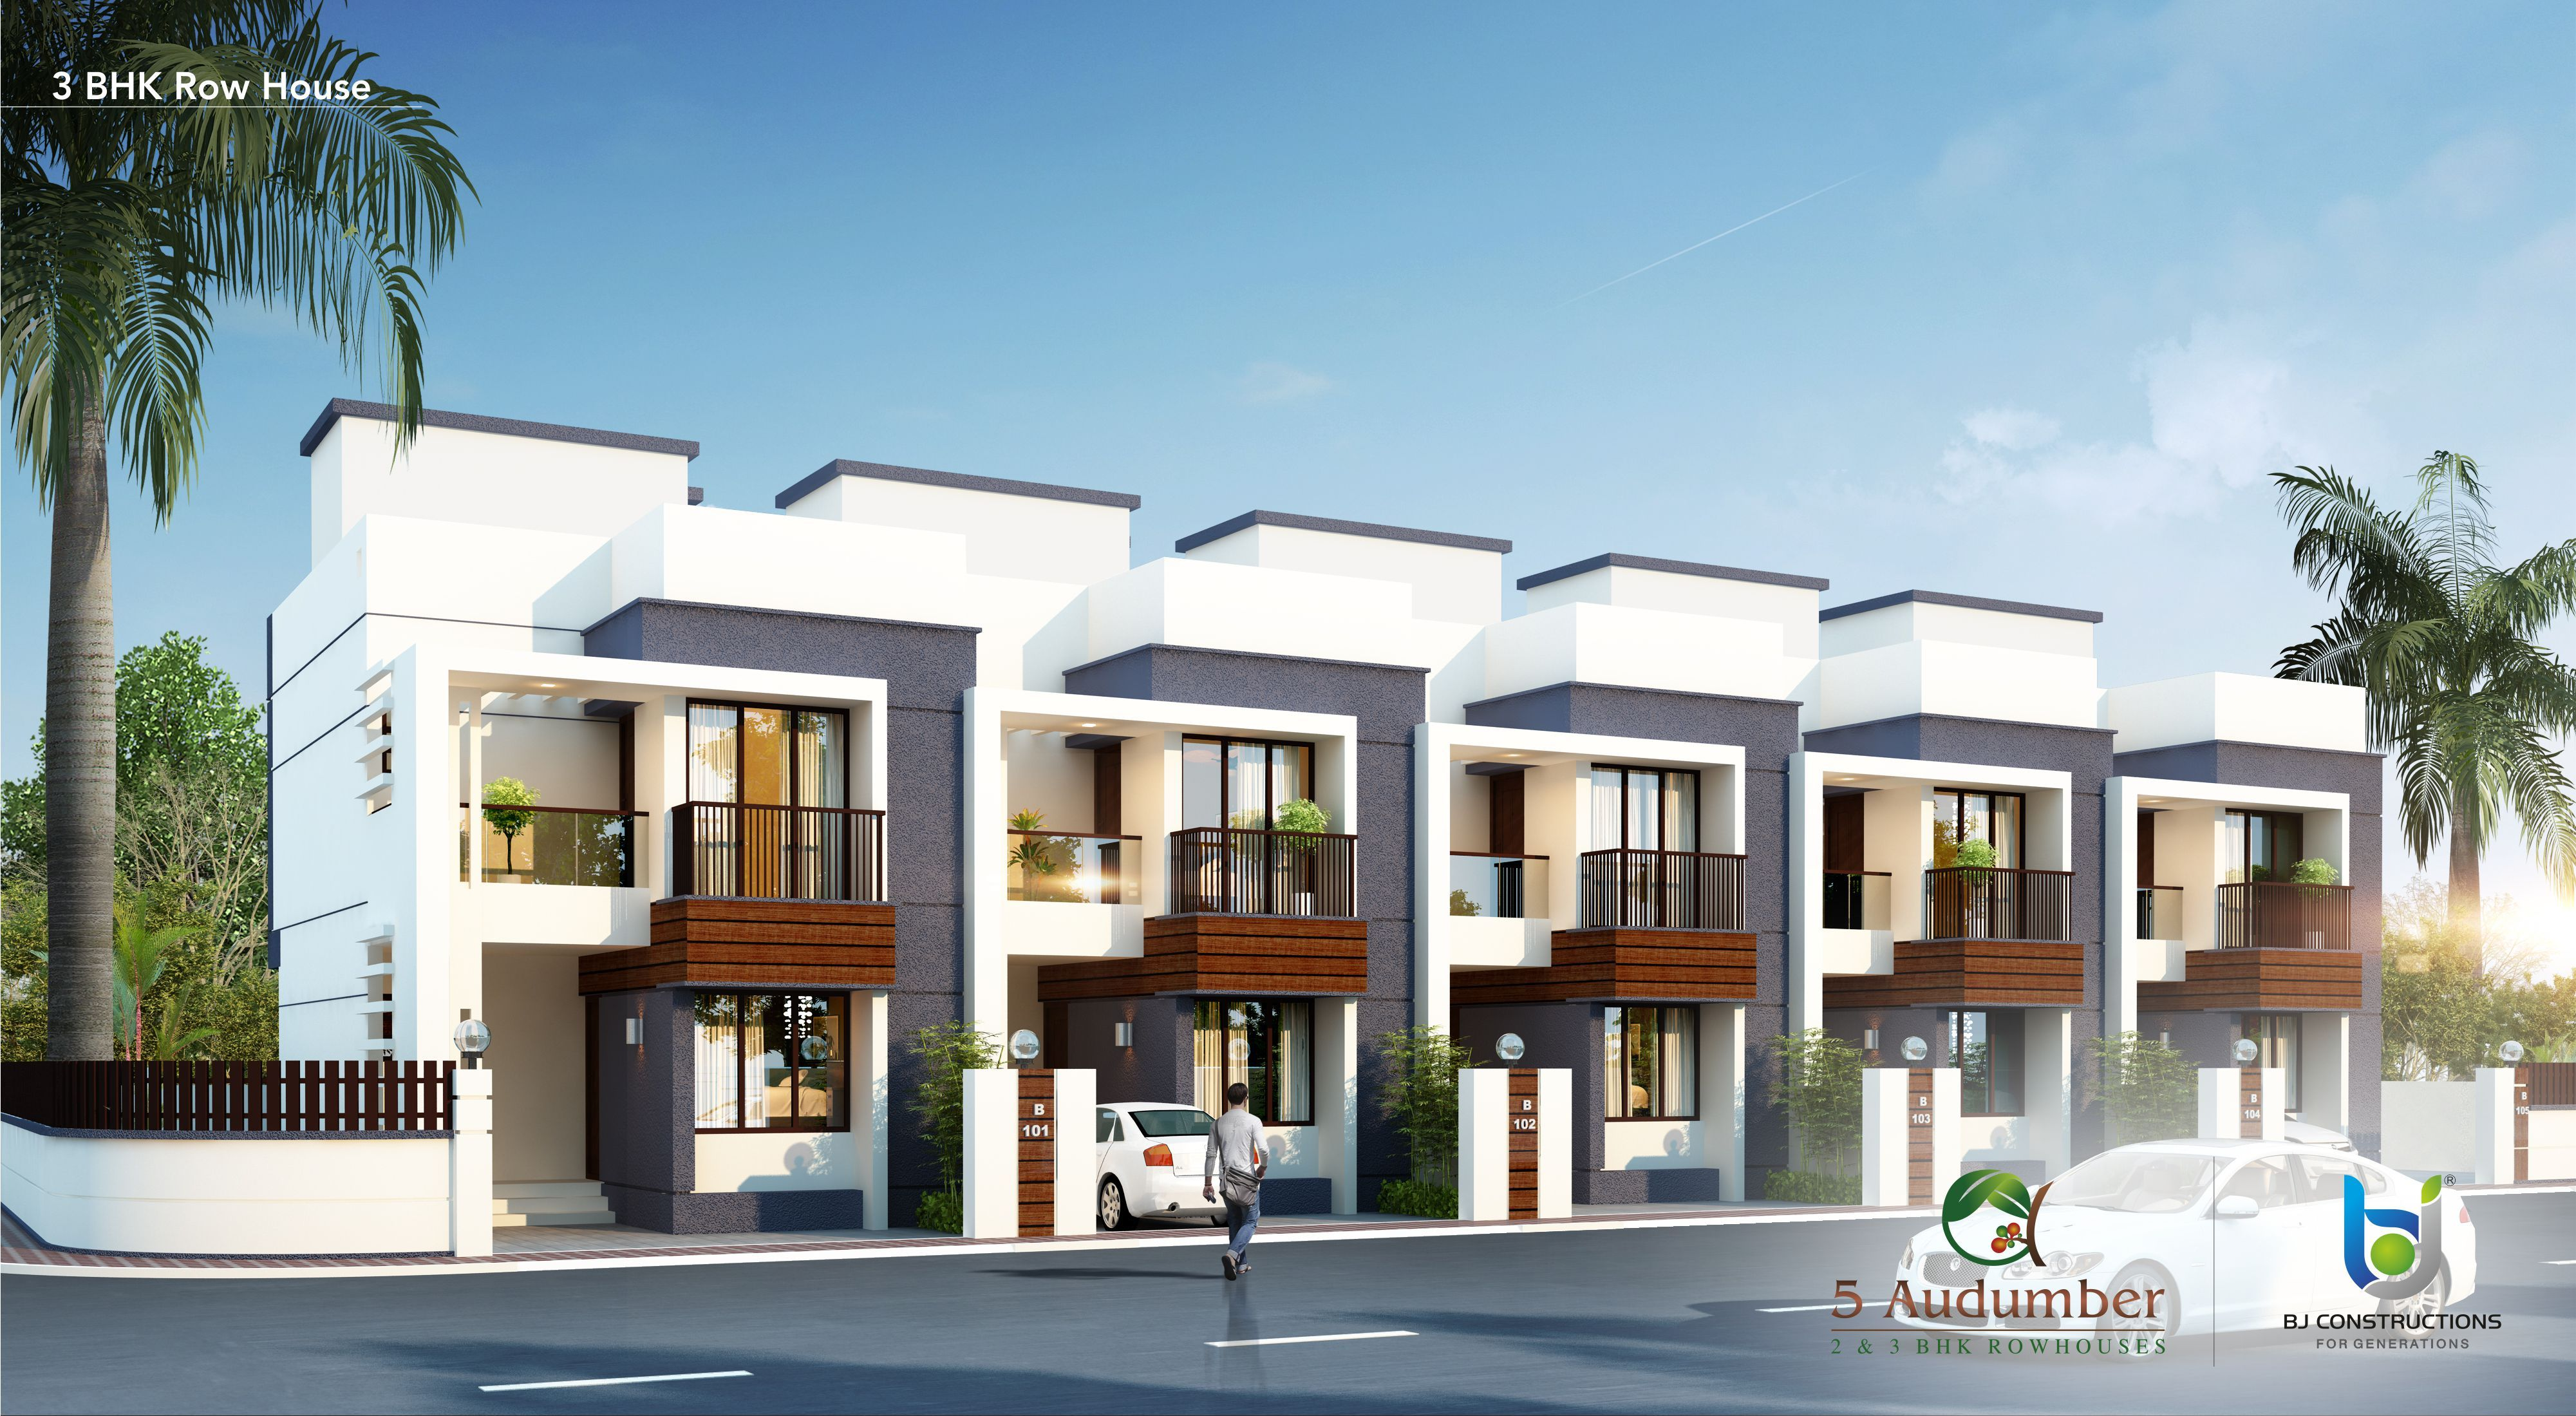 5 Audumber 2bhk 3 Bhk Row House Shirur Row House Design Modern Bungalow House Duplex House Design